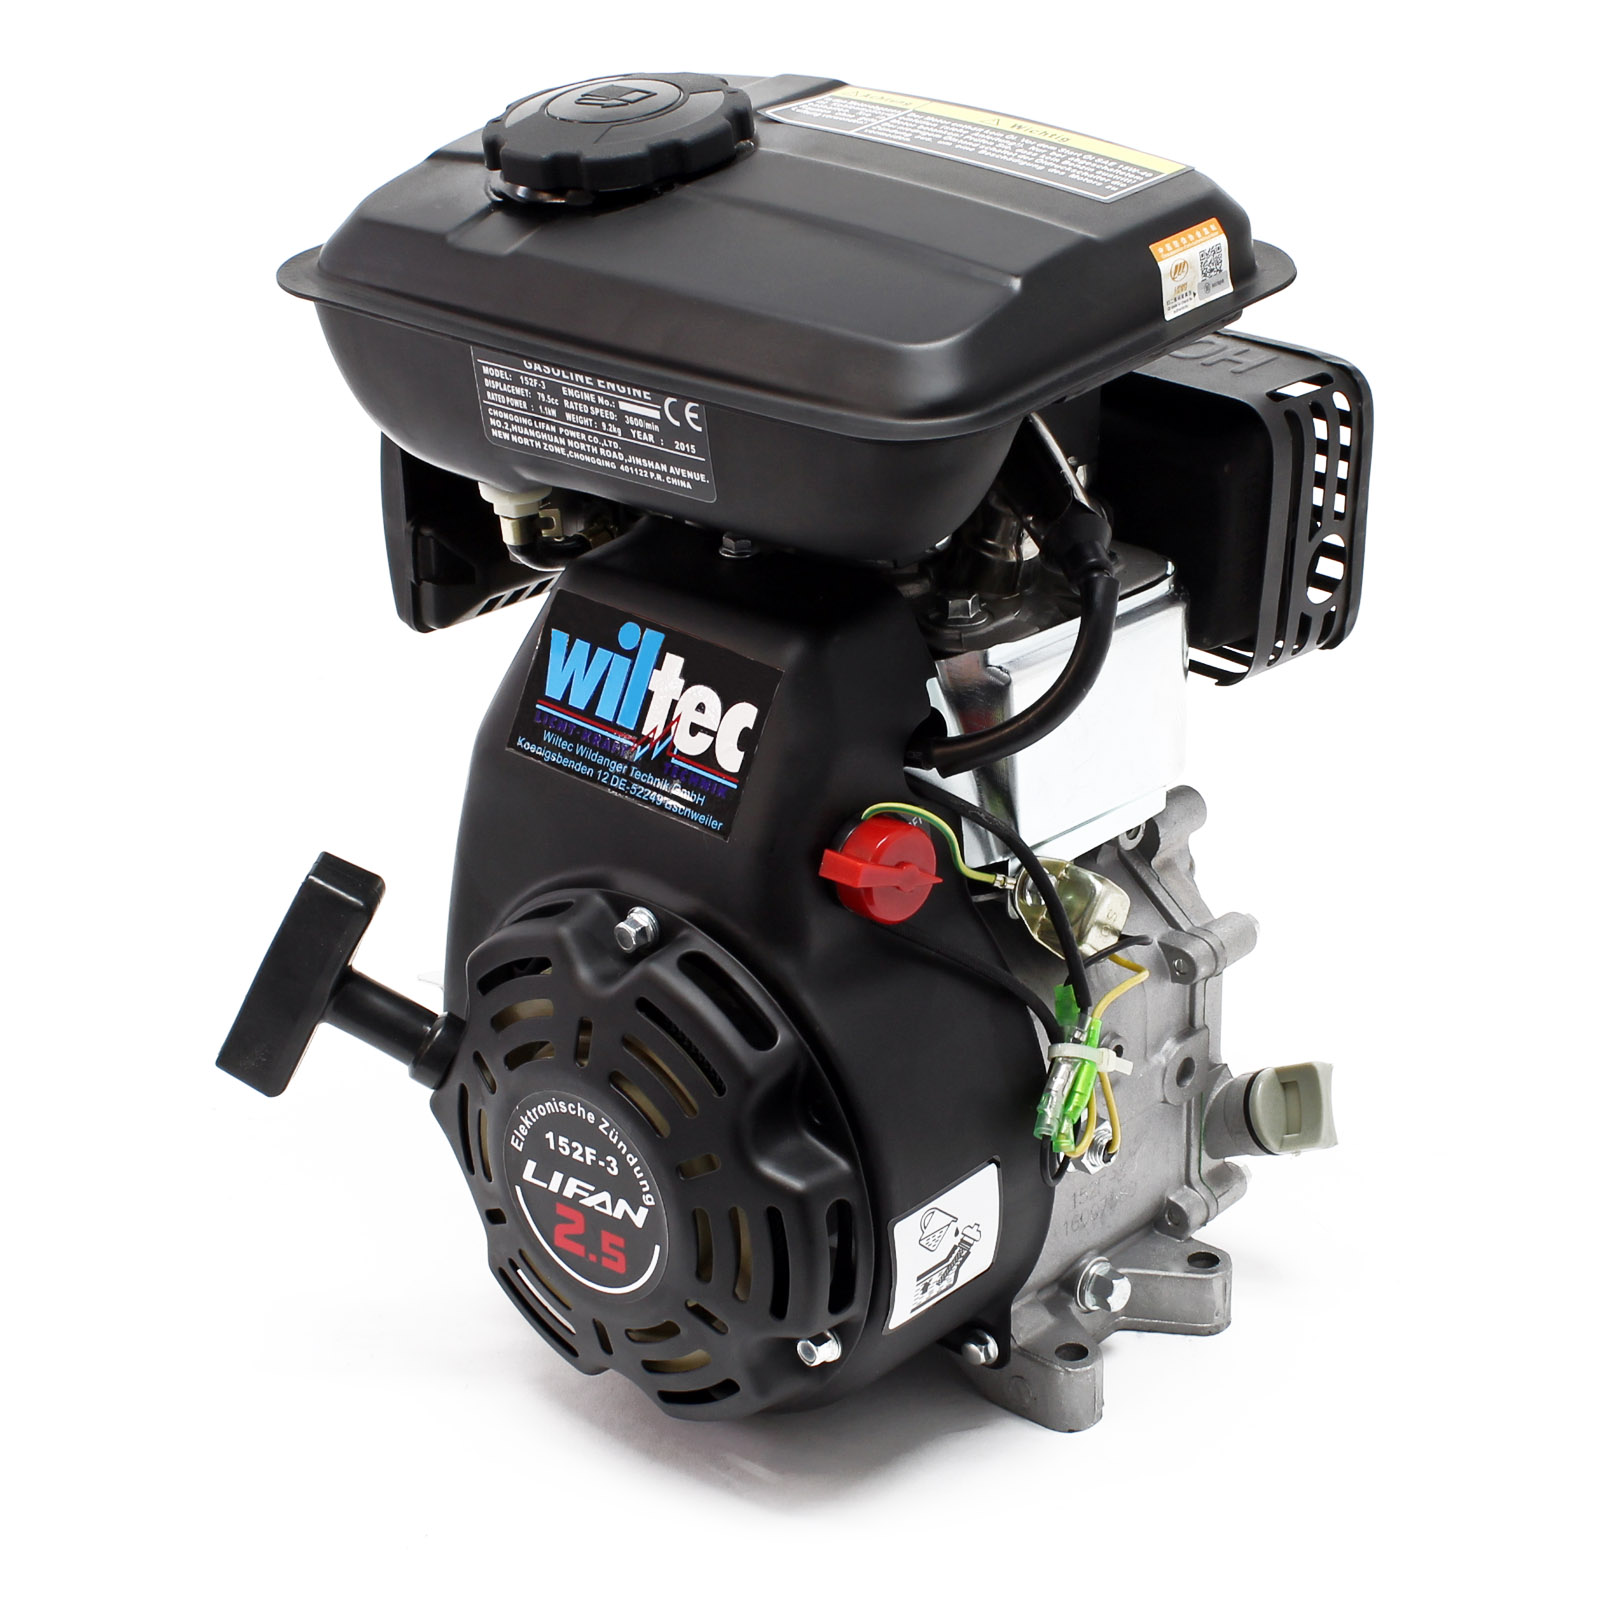 lifan 168 moteur essence 6 5cv lanceur reducteur 2. Black Bedroom Furniture Sets. Home Design Ideas